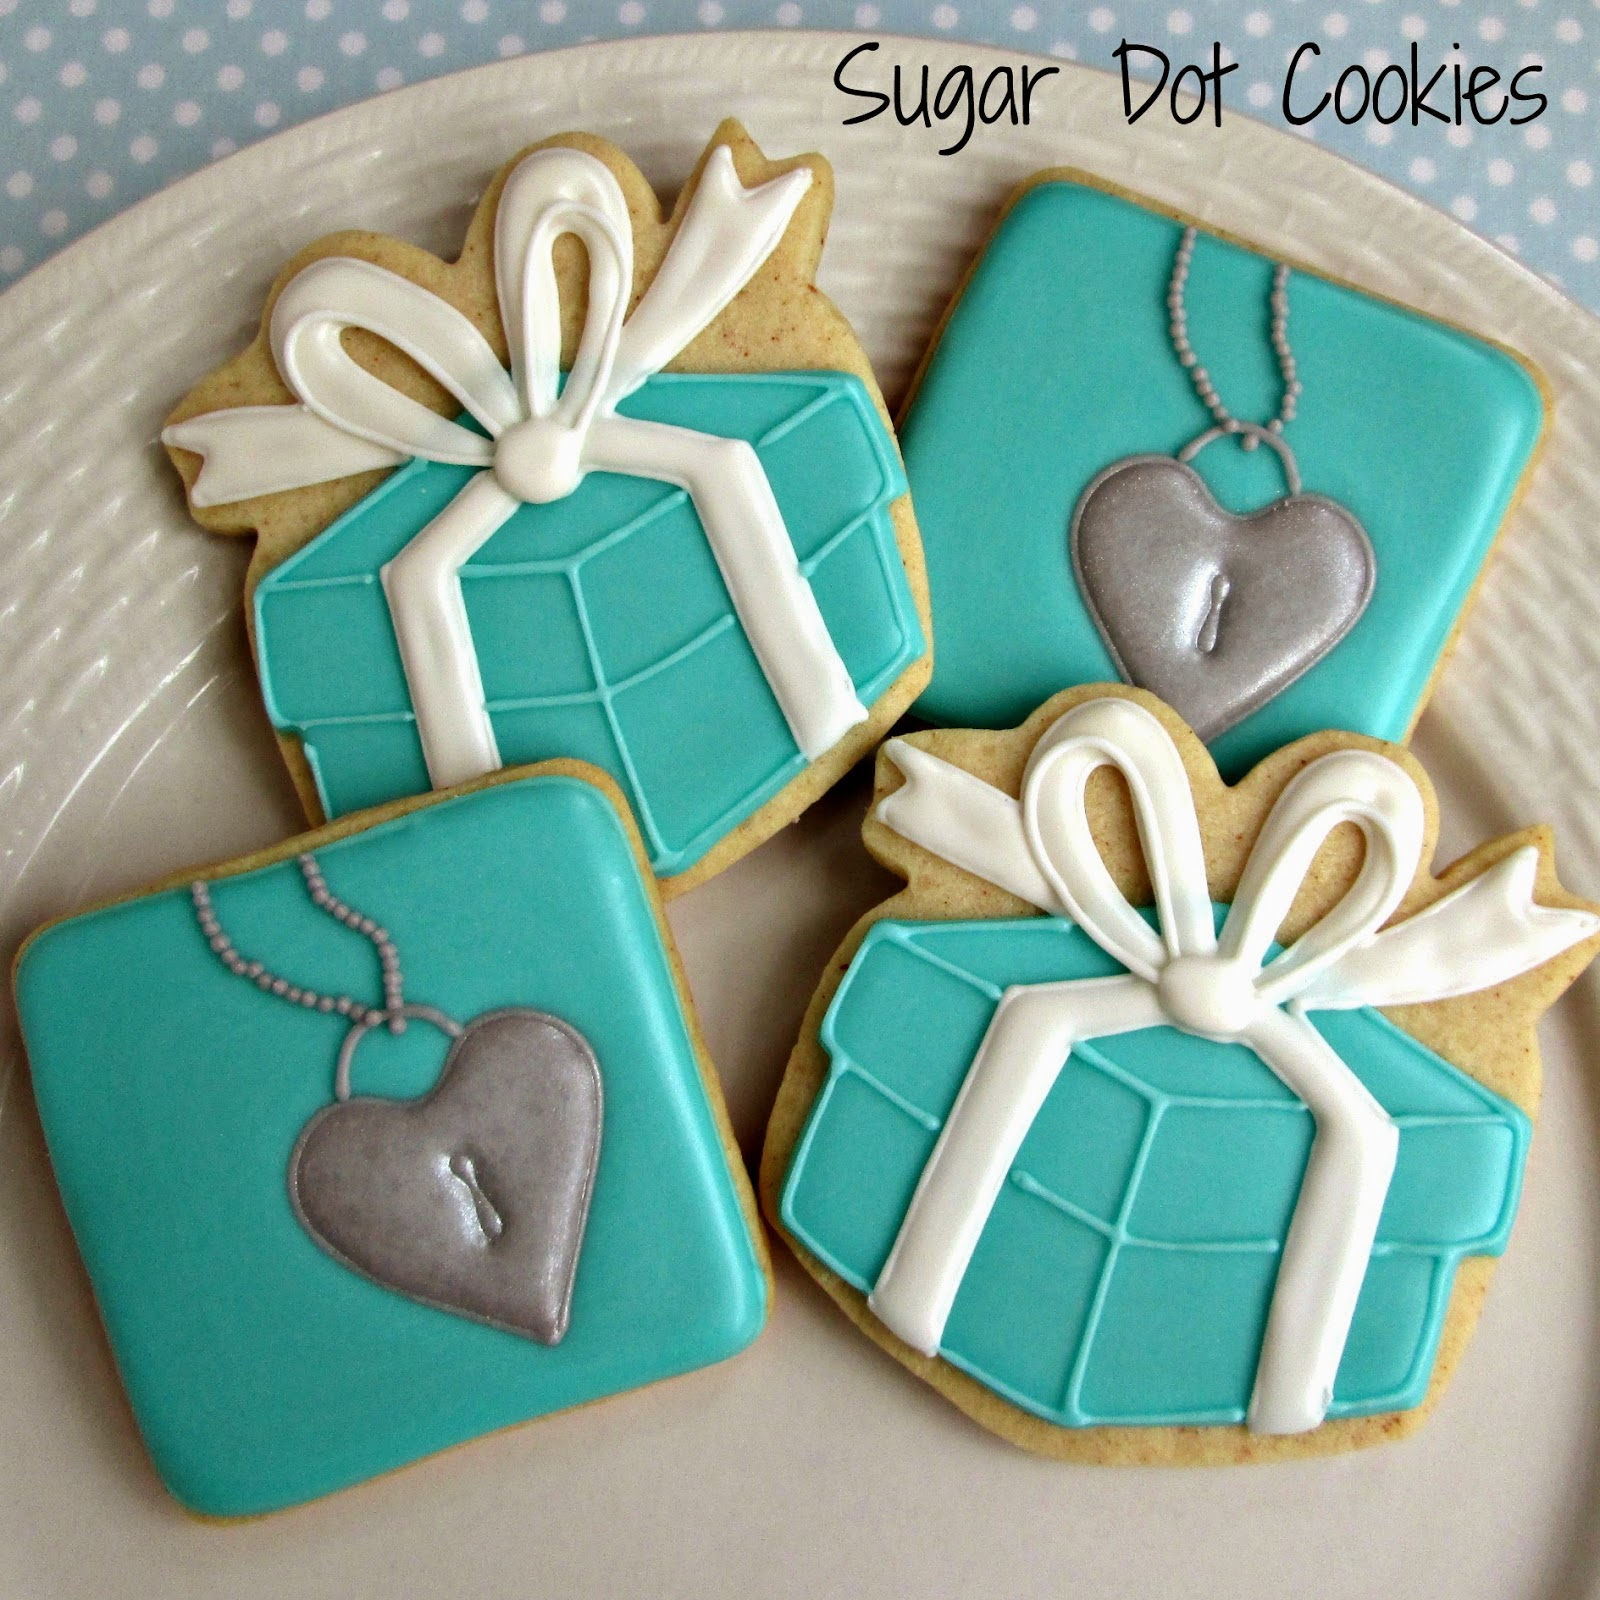 Sugar Dot Cookies Tiffany Inspired Cookies